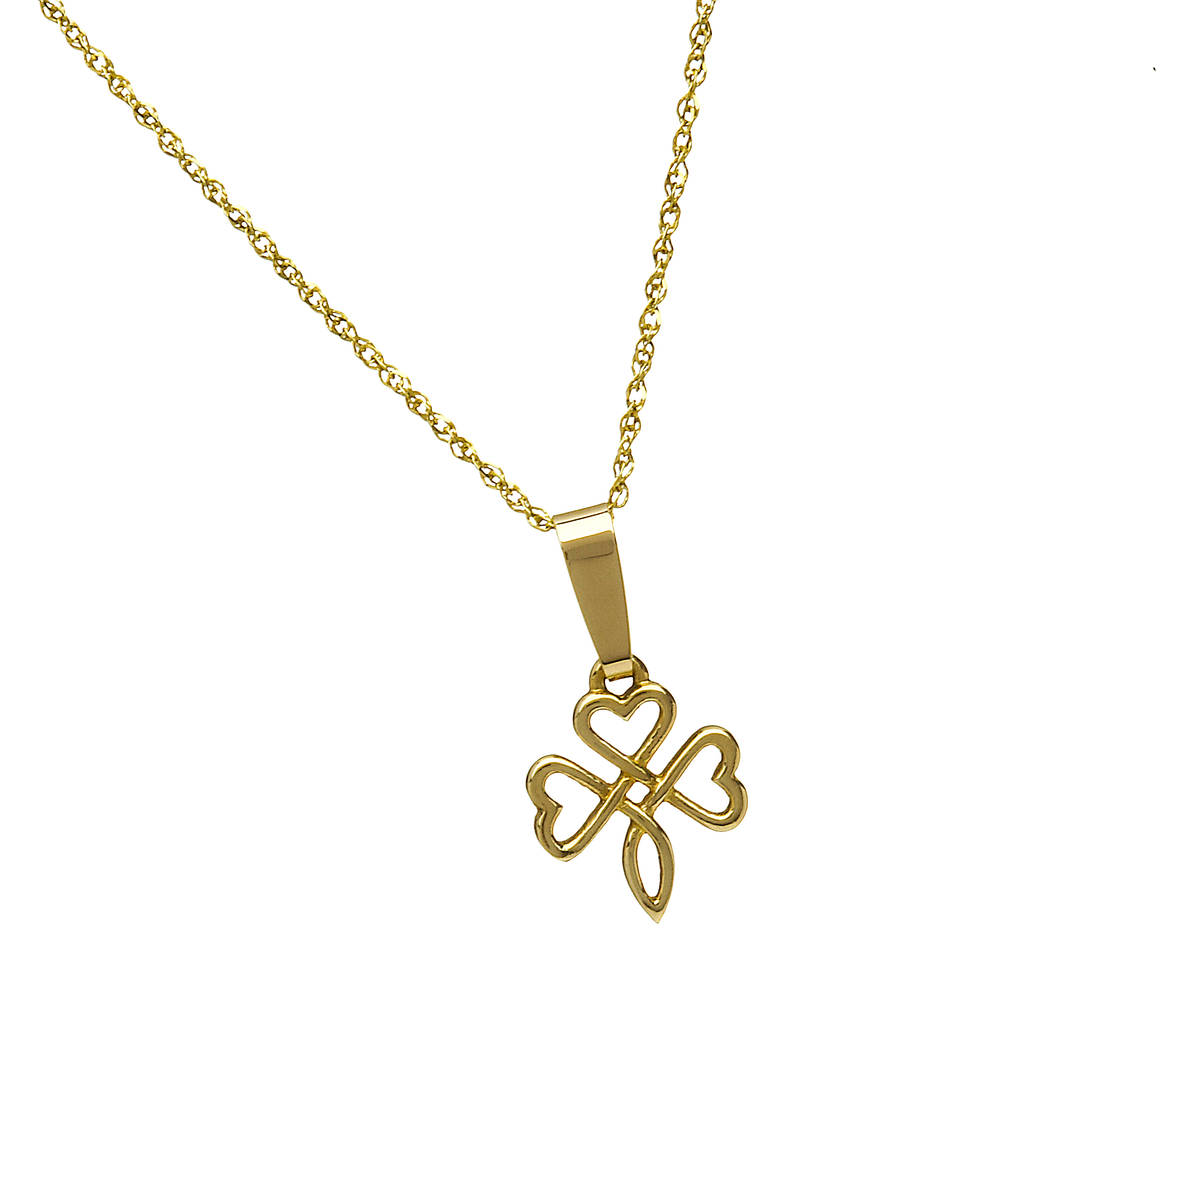 10 carat gold open shamrock knotwork pendant